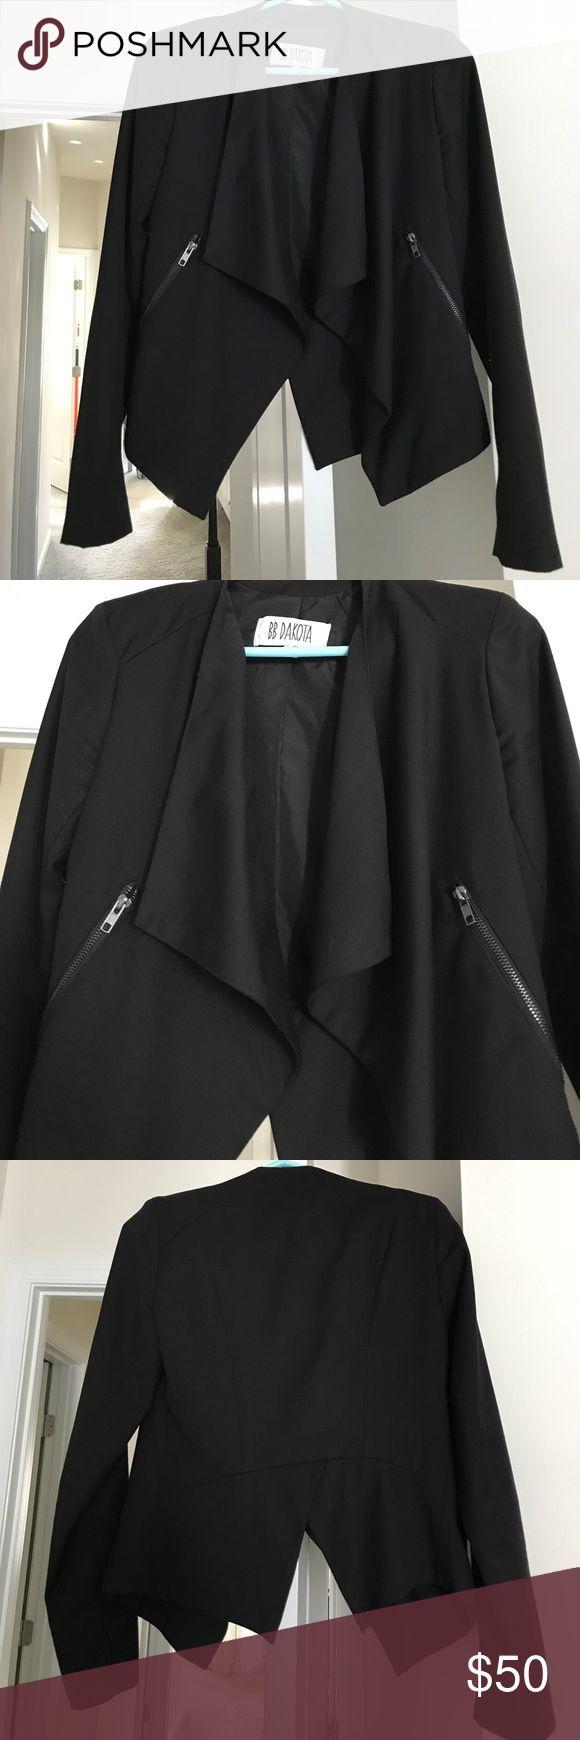 BB Dakota blazer Good condition. Functional zip front pockets. Black. Drape front blazer. Back slit. BB Dakota Jackets & Coats Blazers